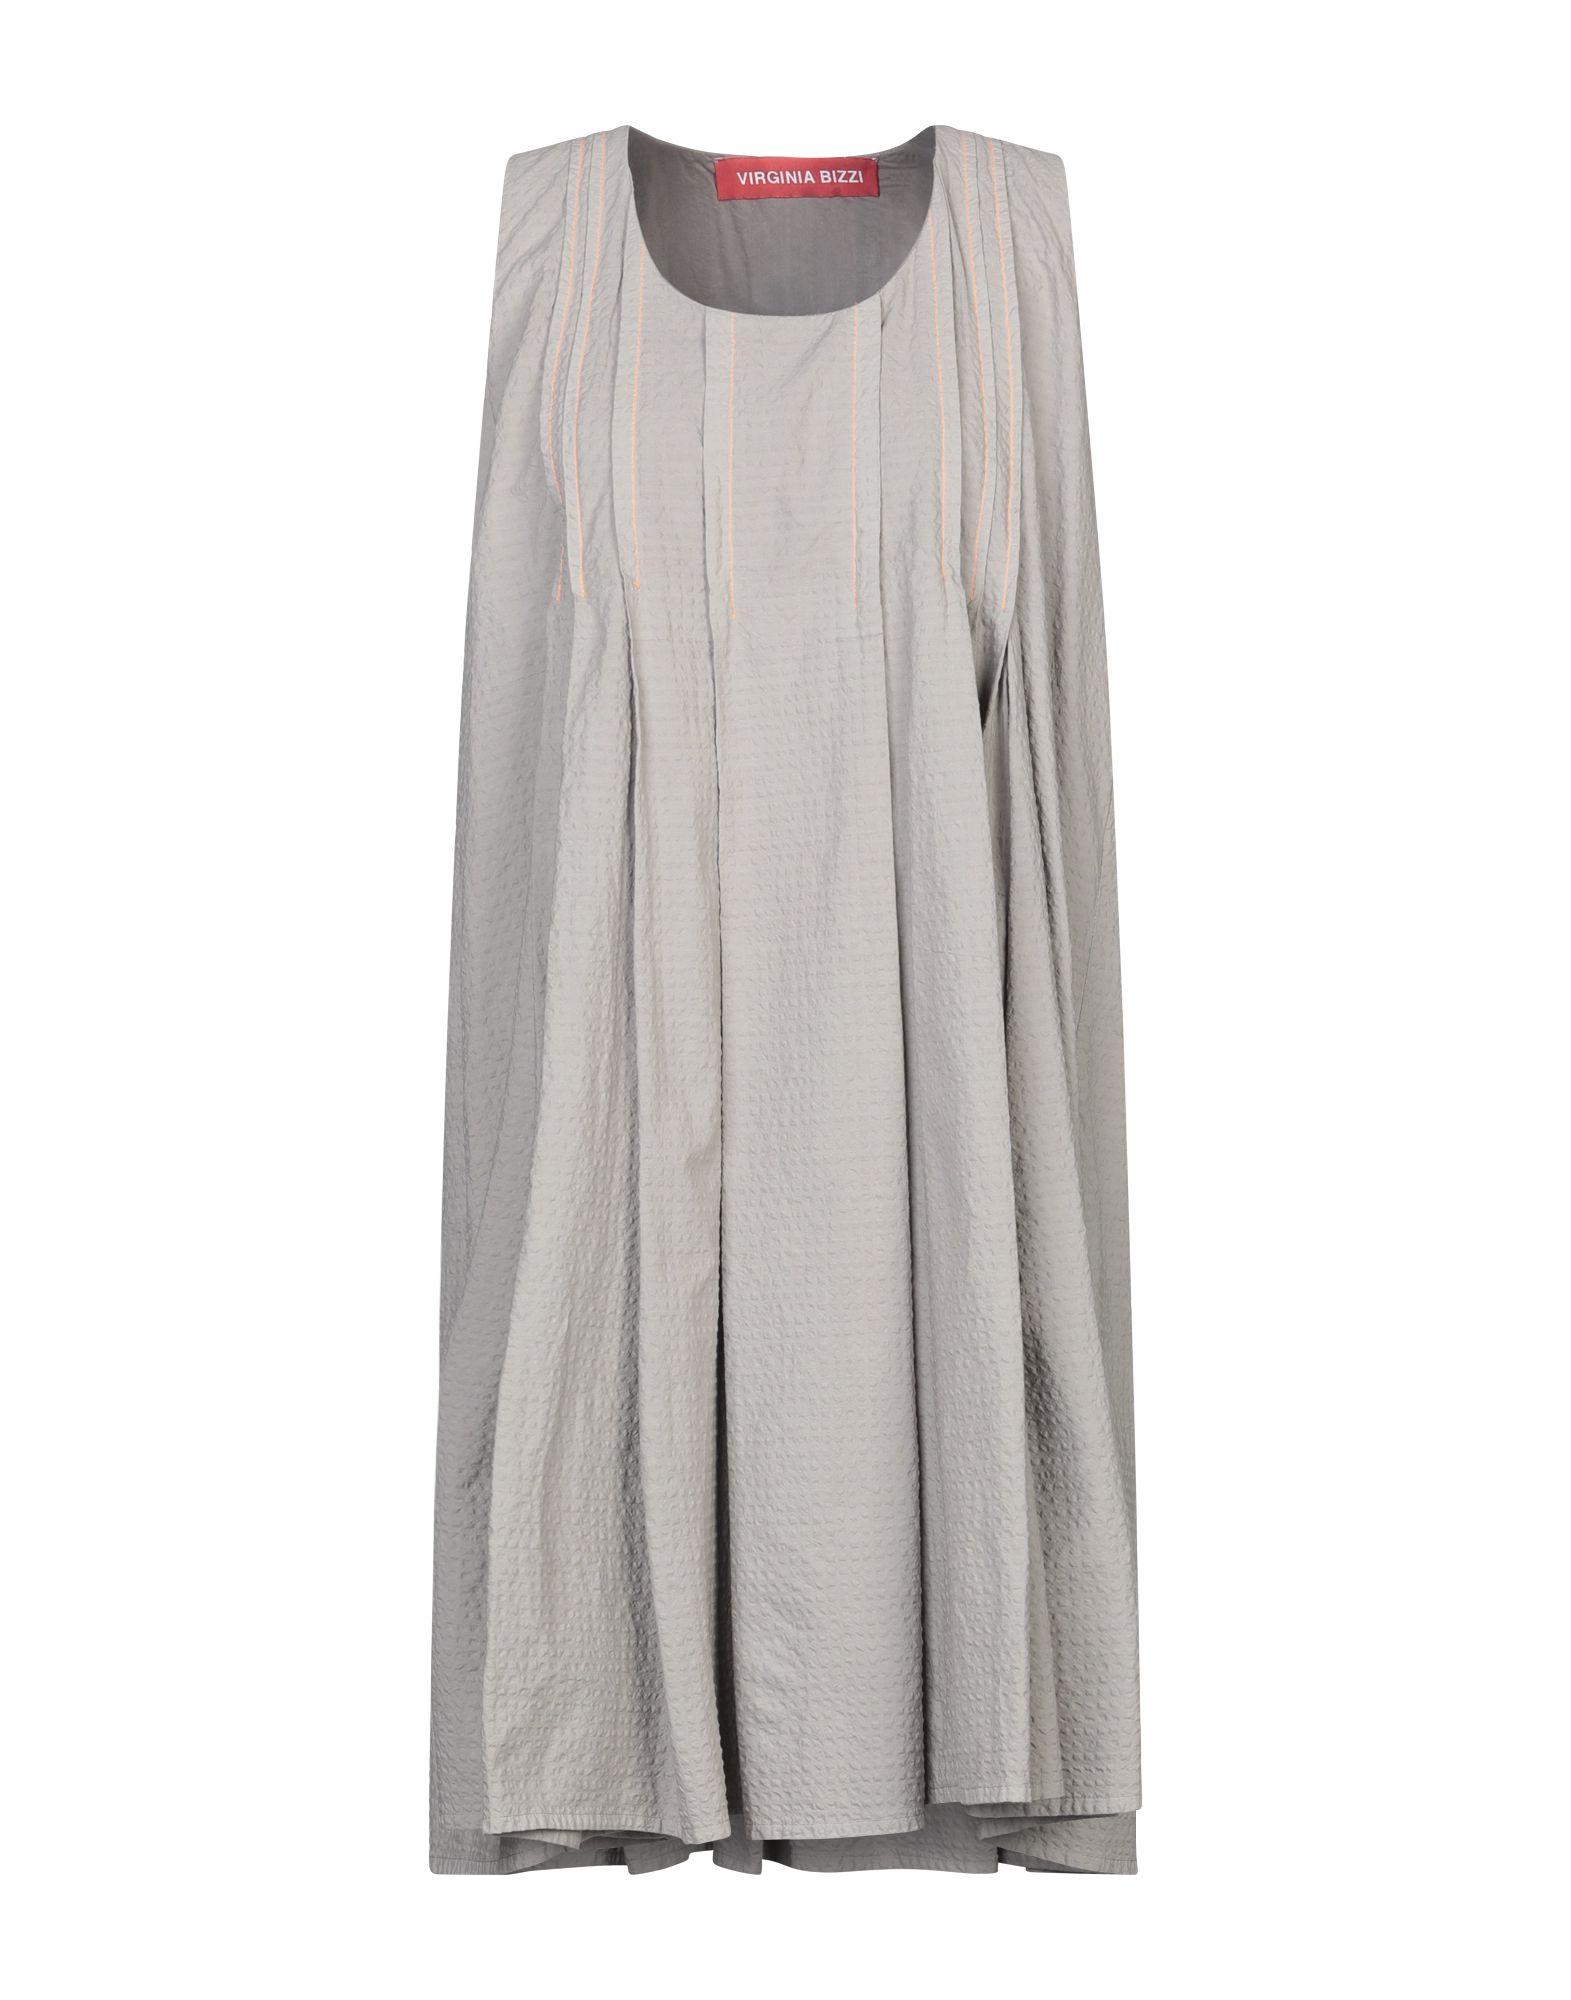 VIRGINIA BIZZI Короткое платье